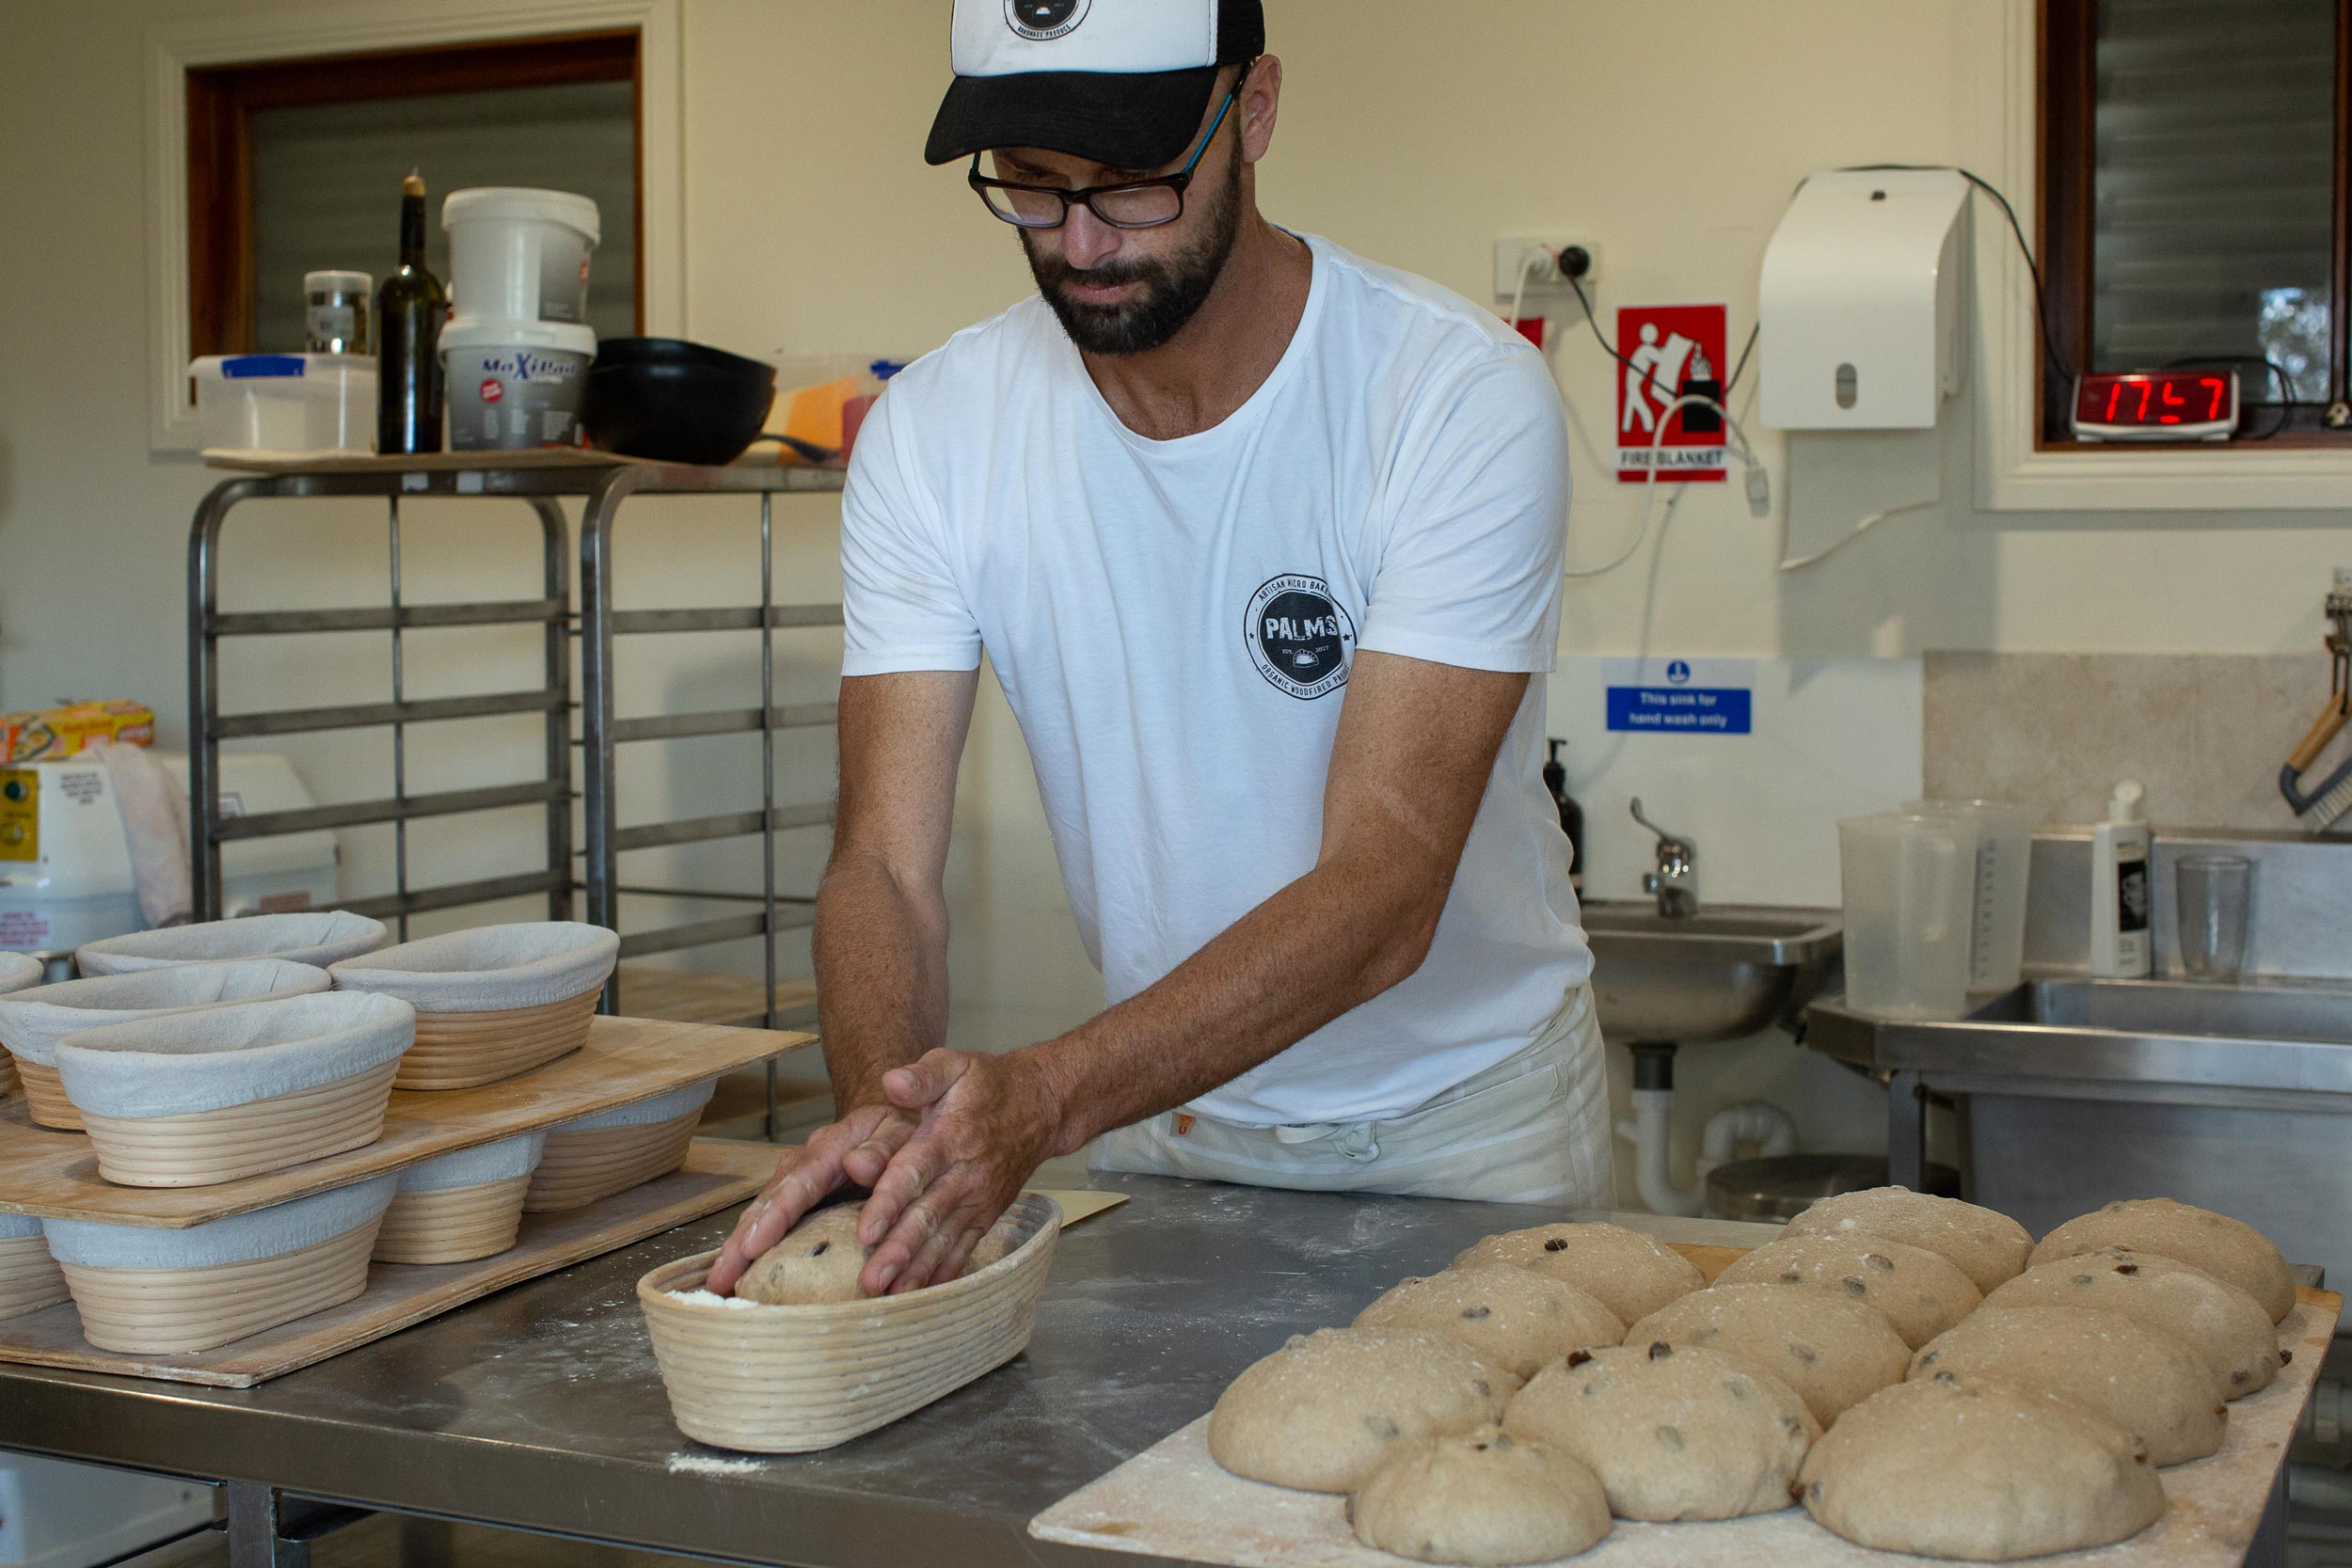 glft-palms-micro-bakery-dough.jpg